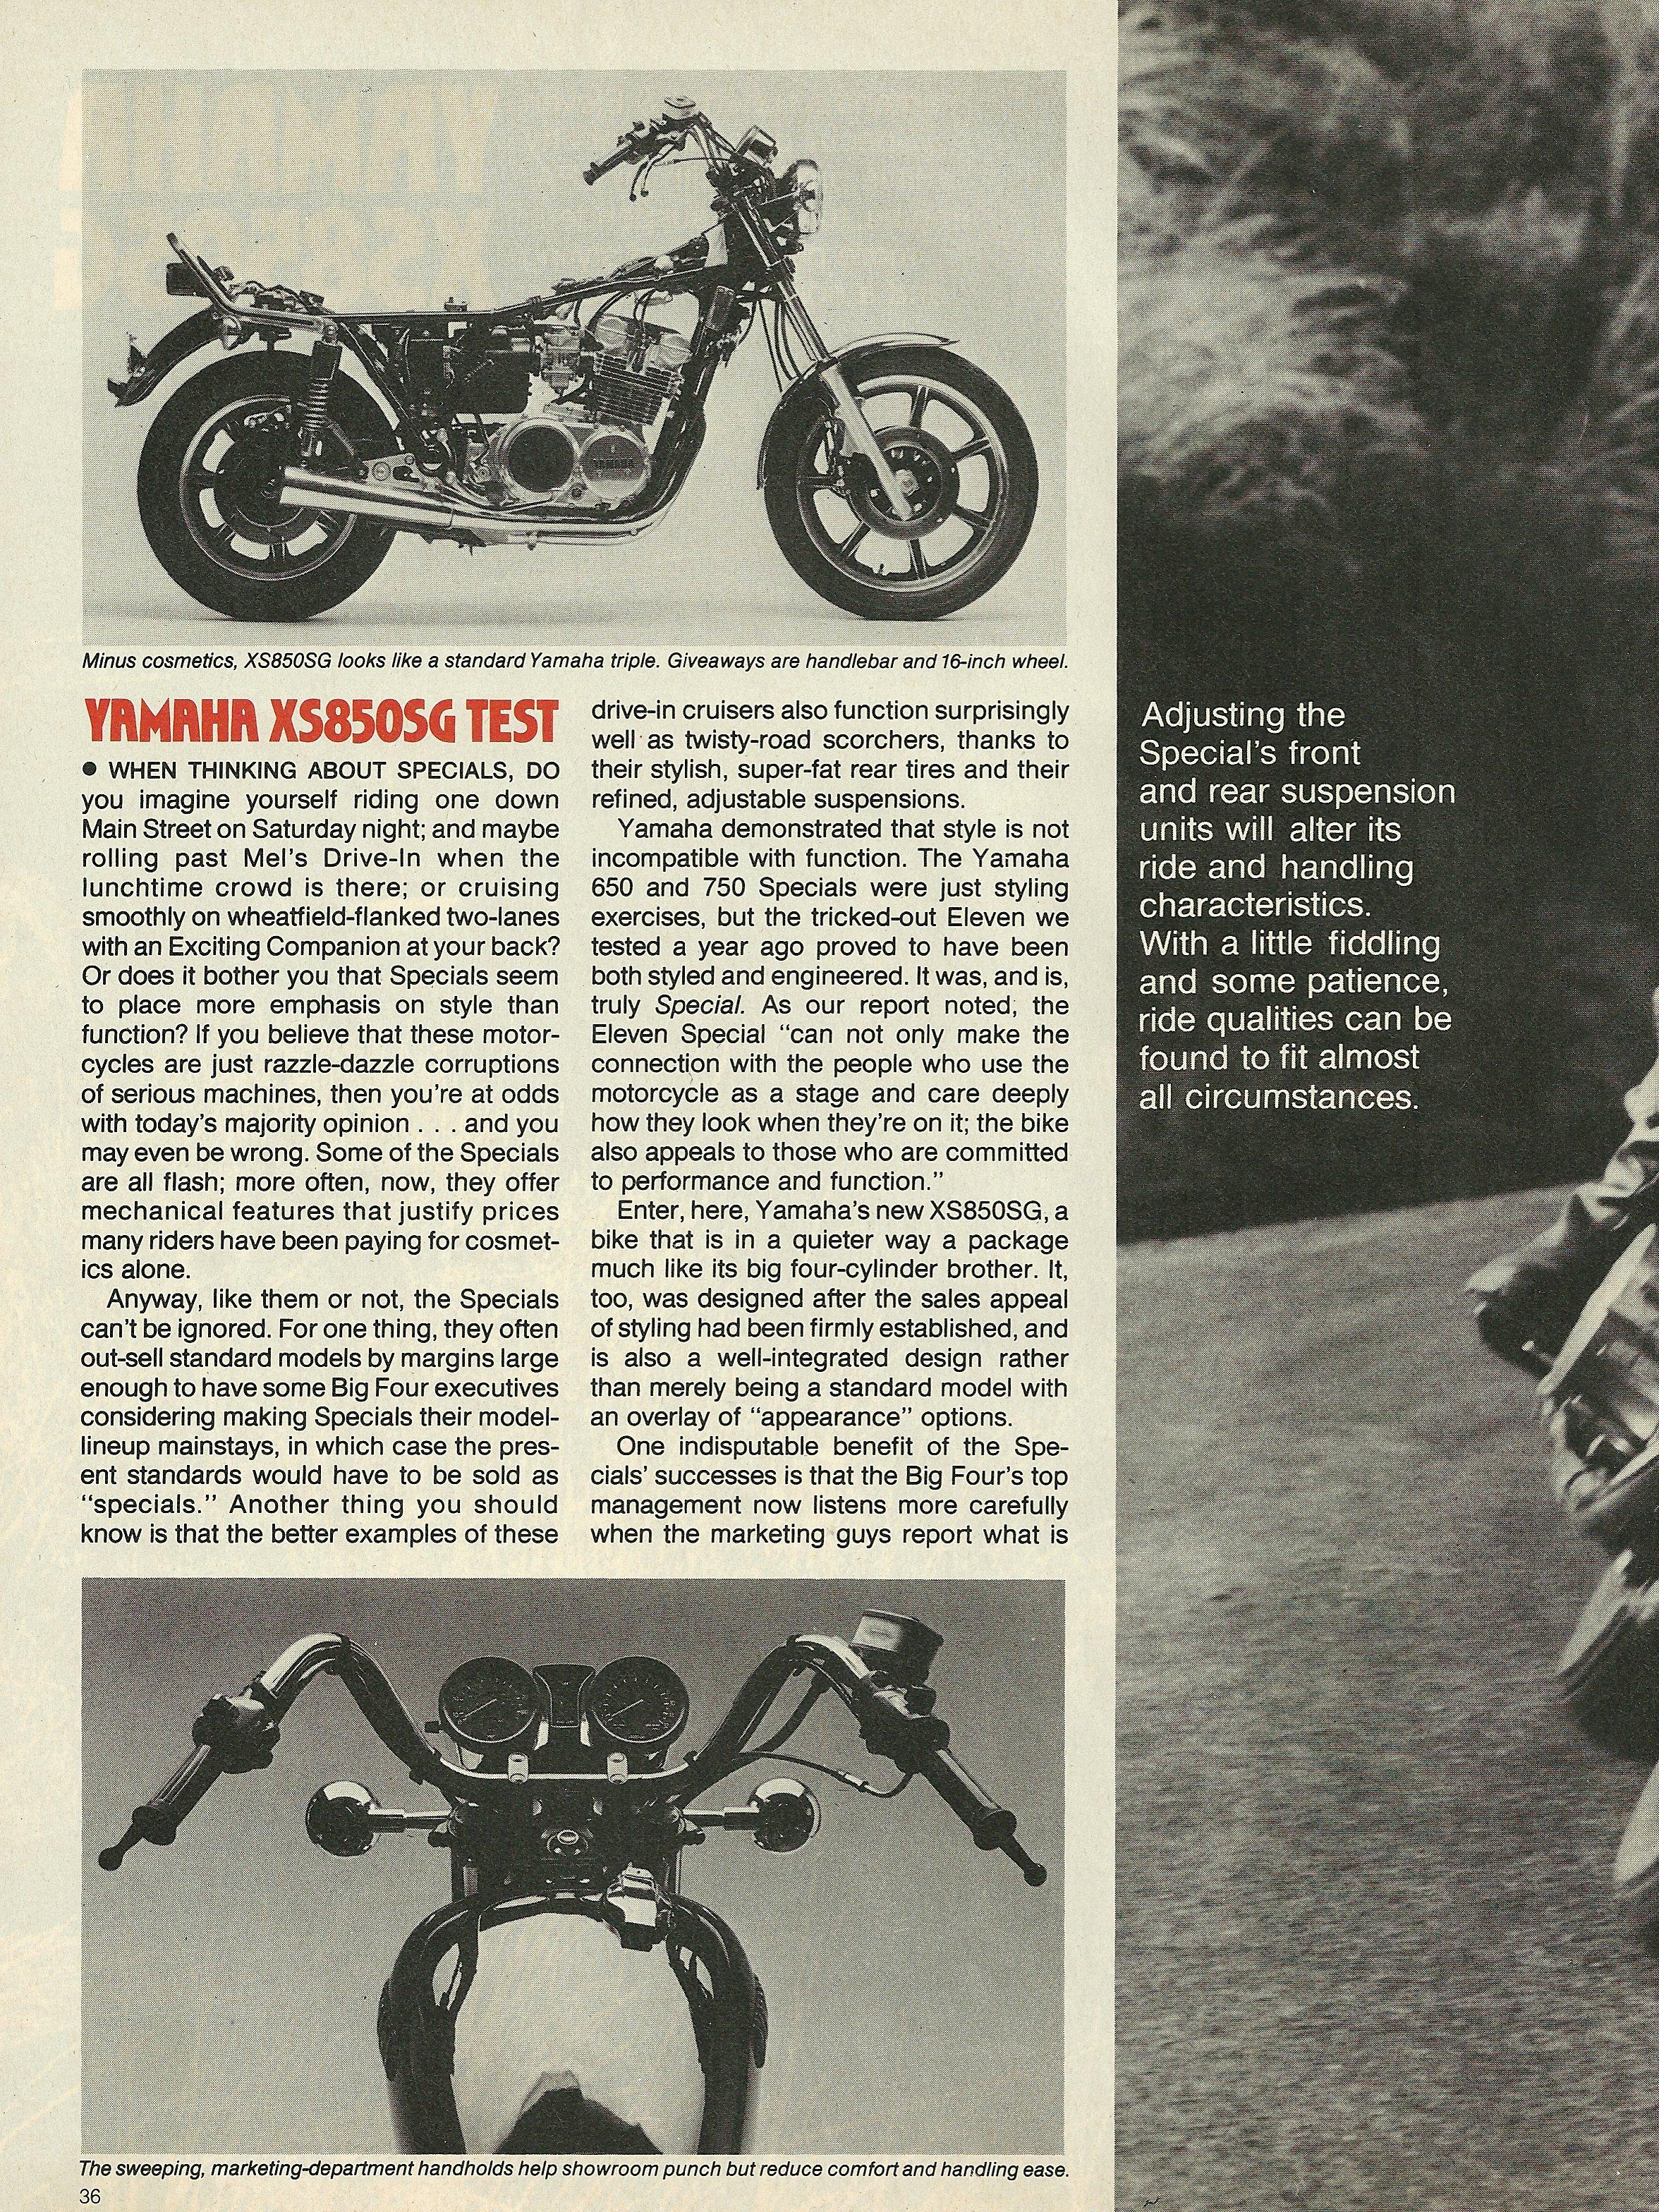 1980 Yamaha XS850SG road test 3.JPG